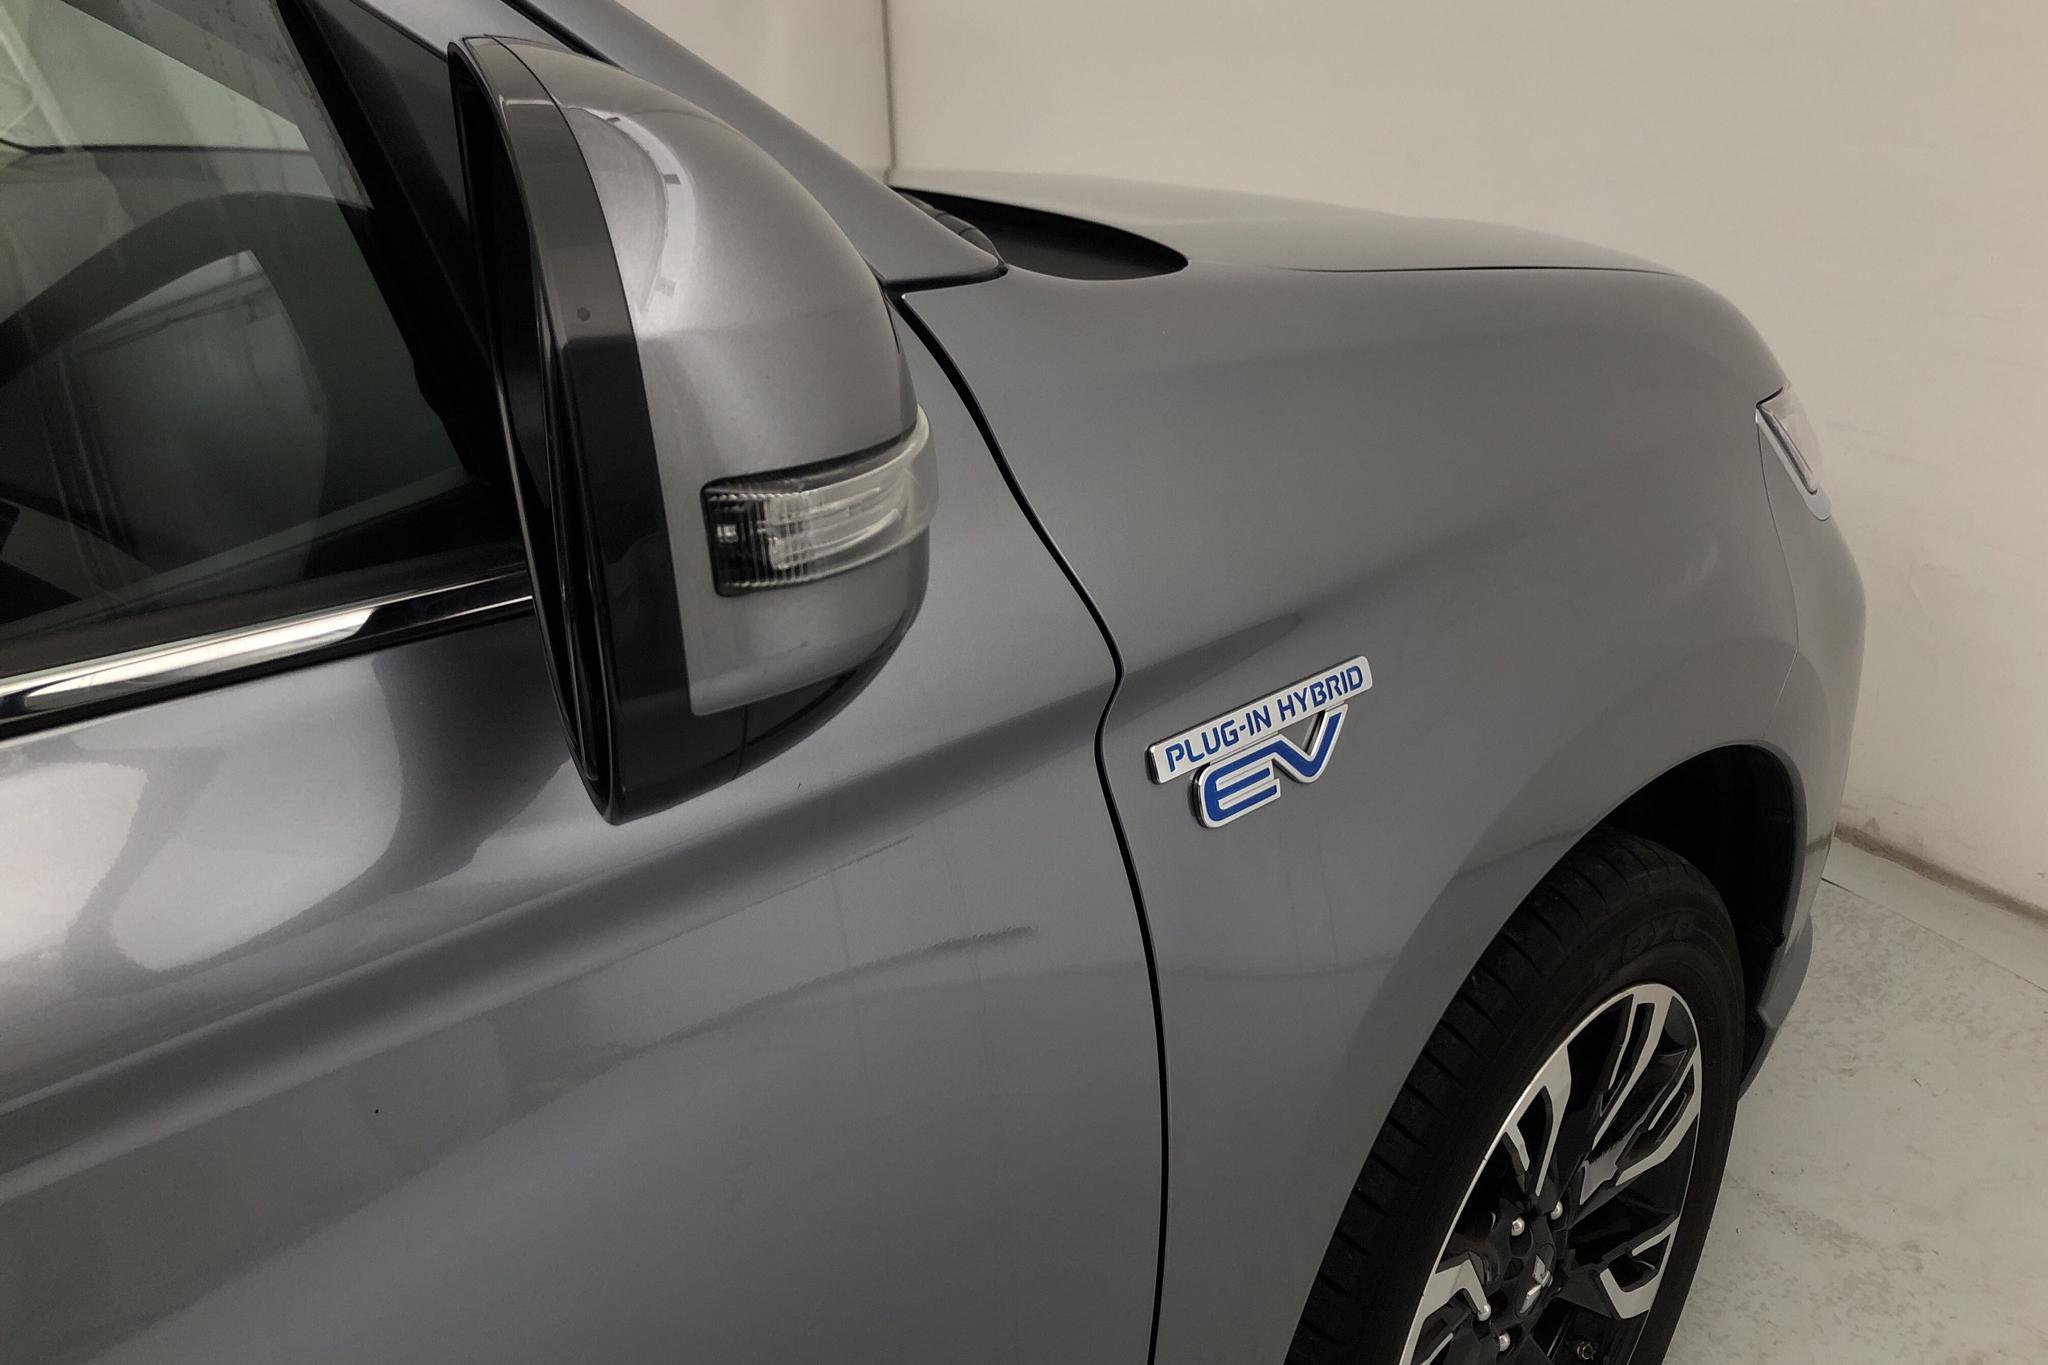 Mitsubishi Outlander 2.0 Plug-in Hybrid 4WD (121hk) - 57 660 km - Automatic - 2016